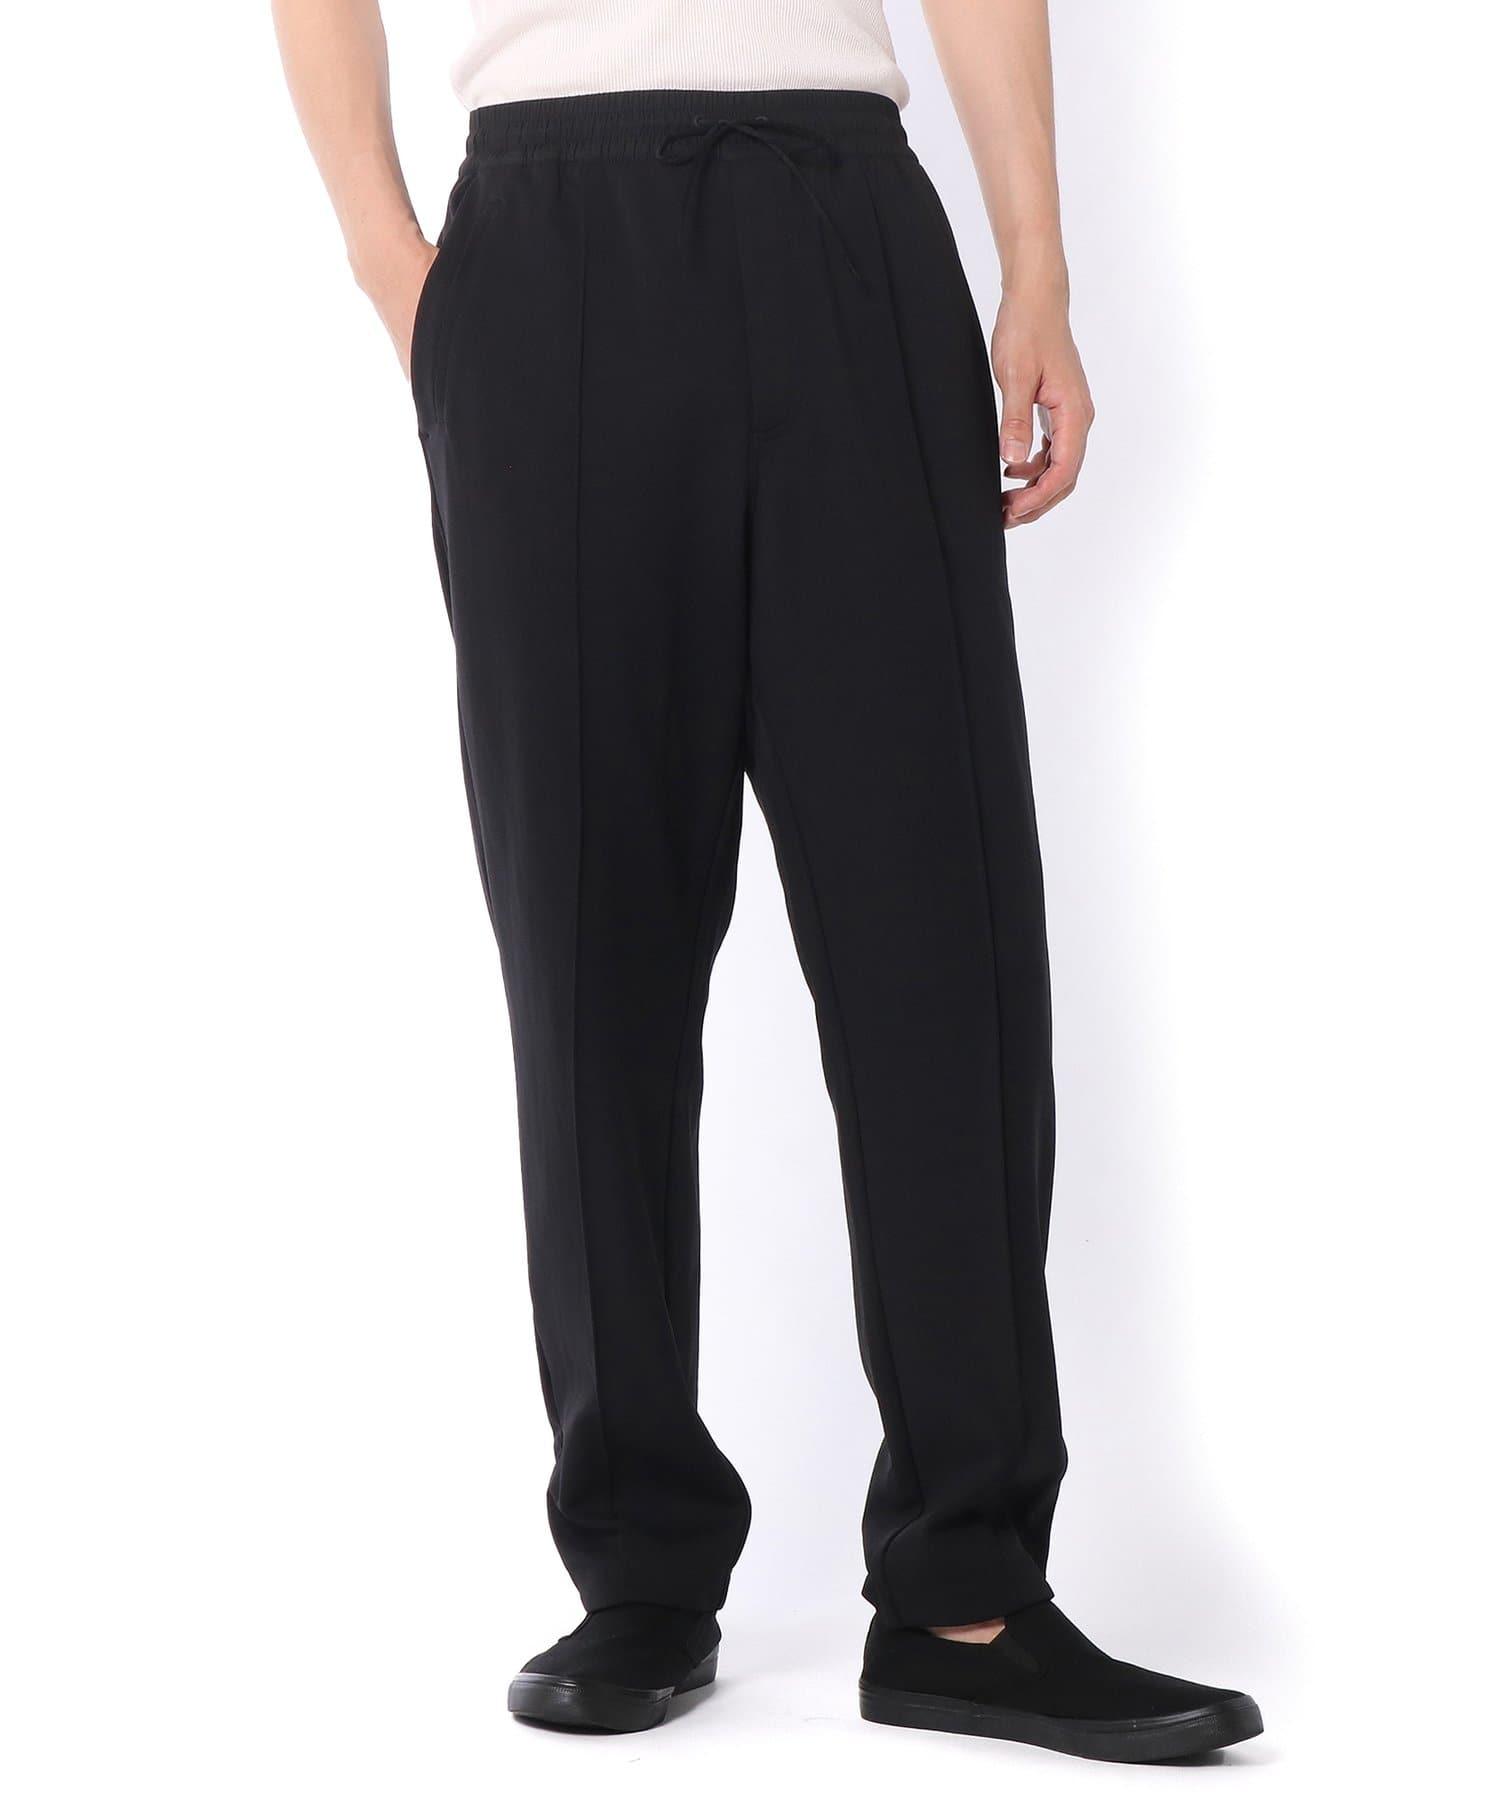 Lui's(ルイス) メンズ 【Y-3】 M CLASSIC STRAIGHT LEG TRACK PANTS ブラック